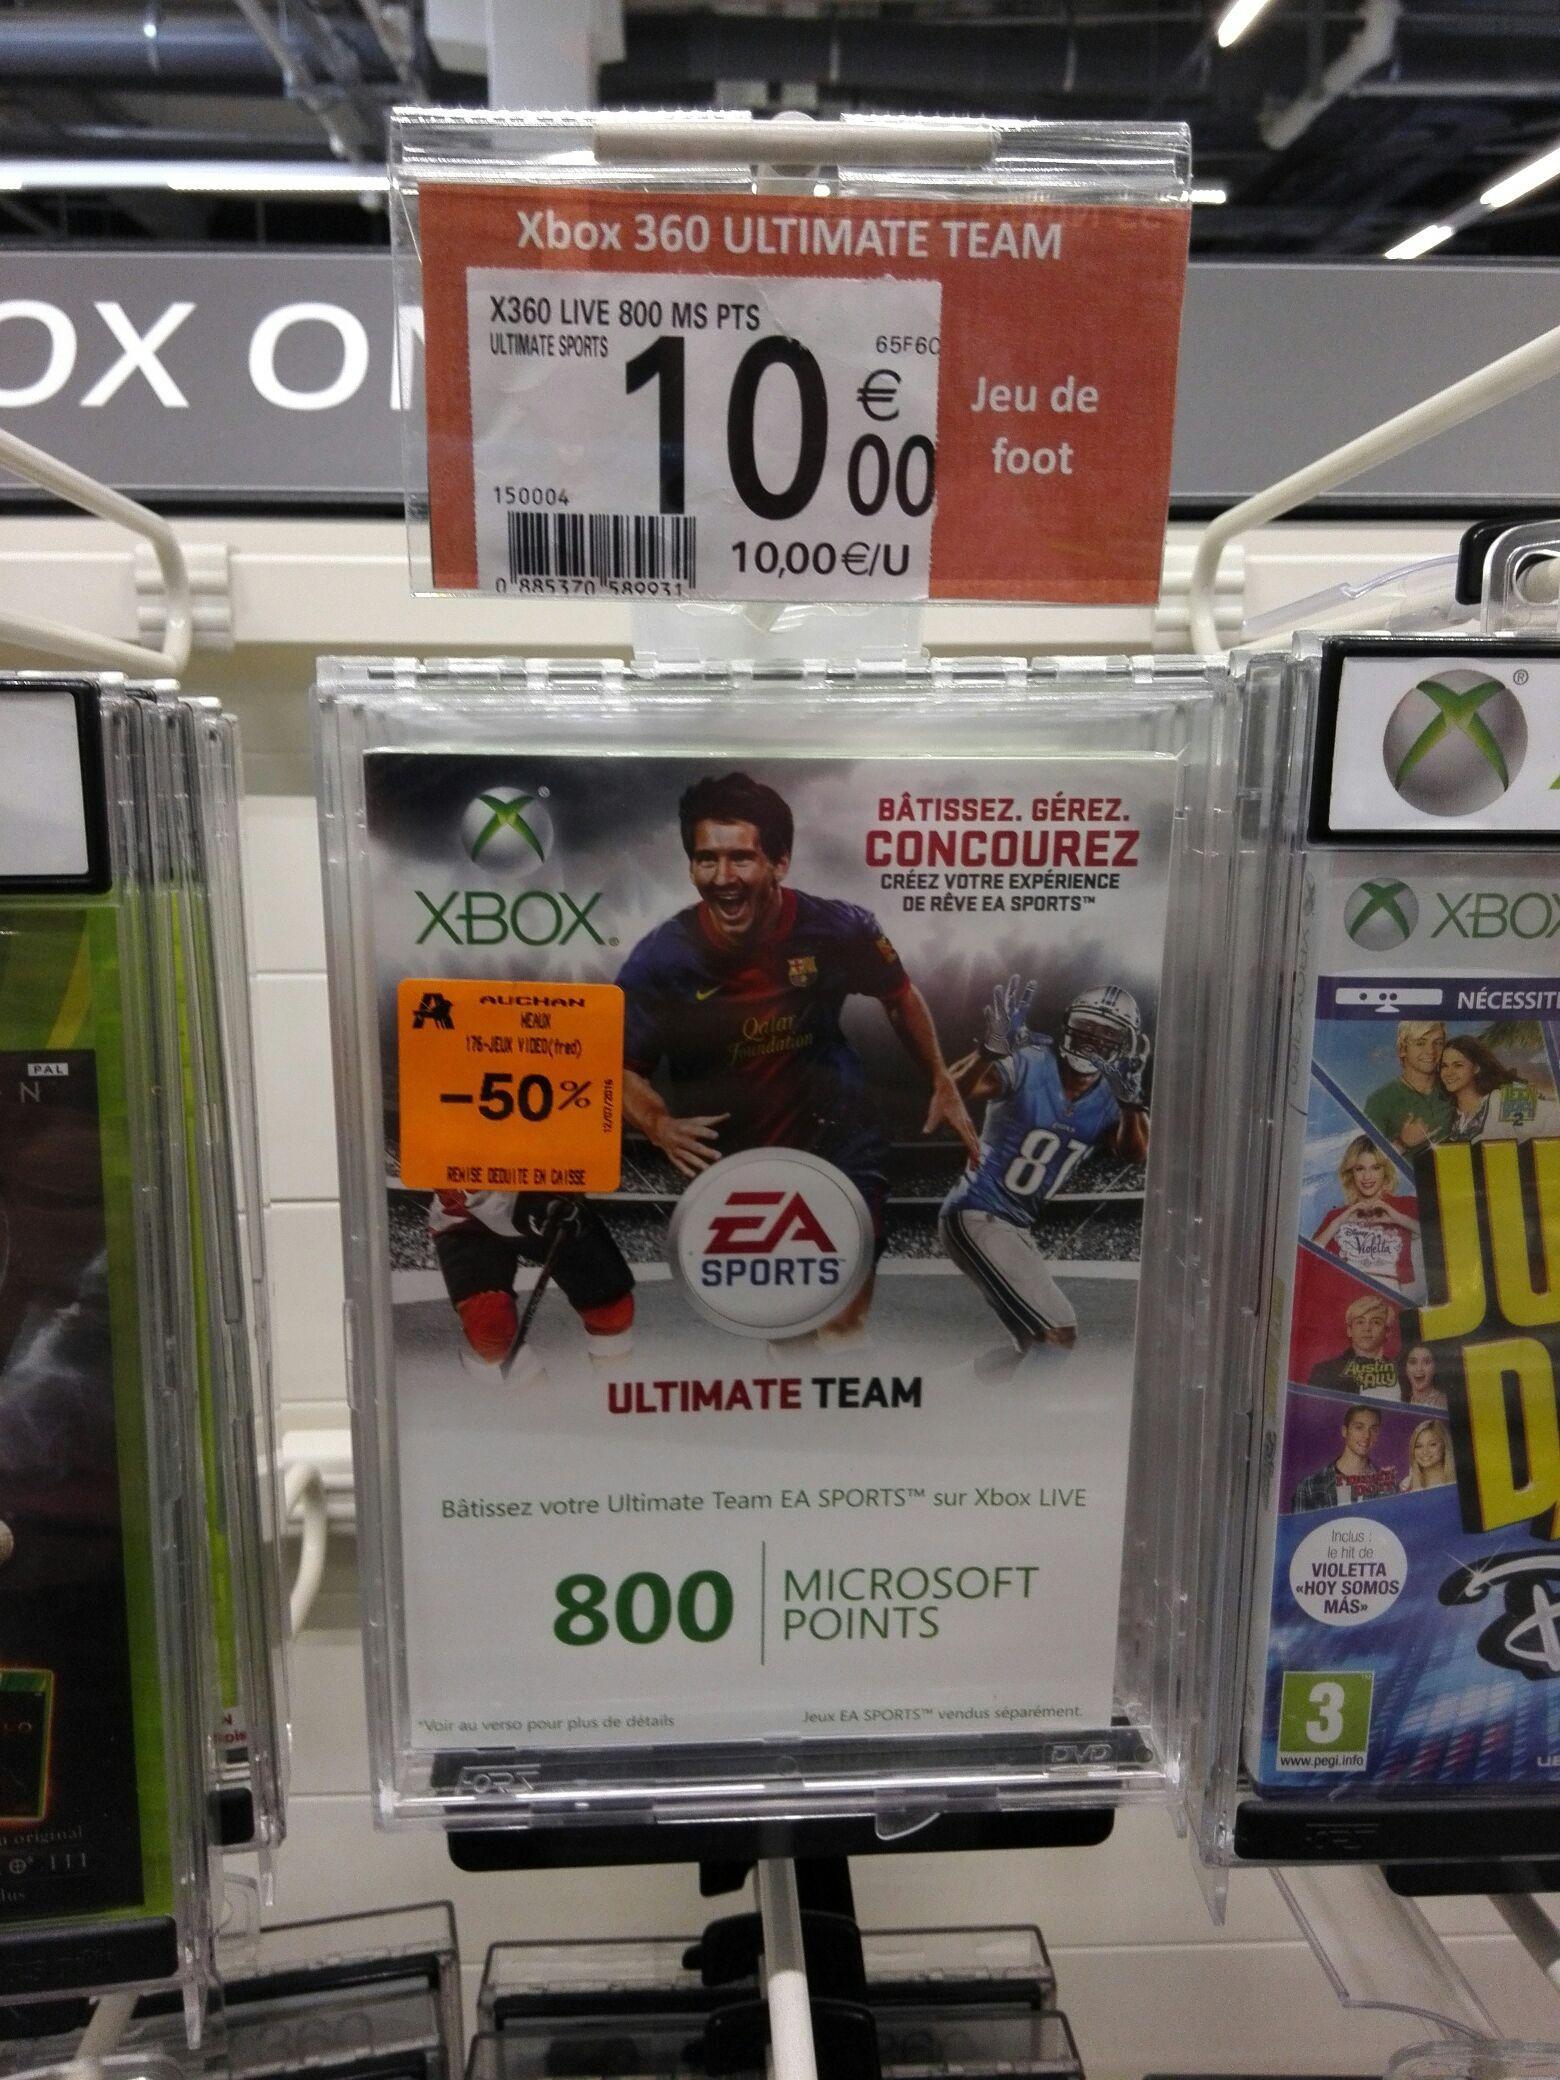 Carte Xbox Live 800 Microsoft Points (9.60€)